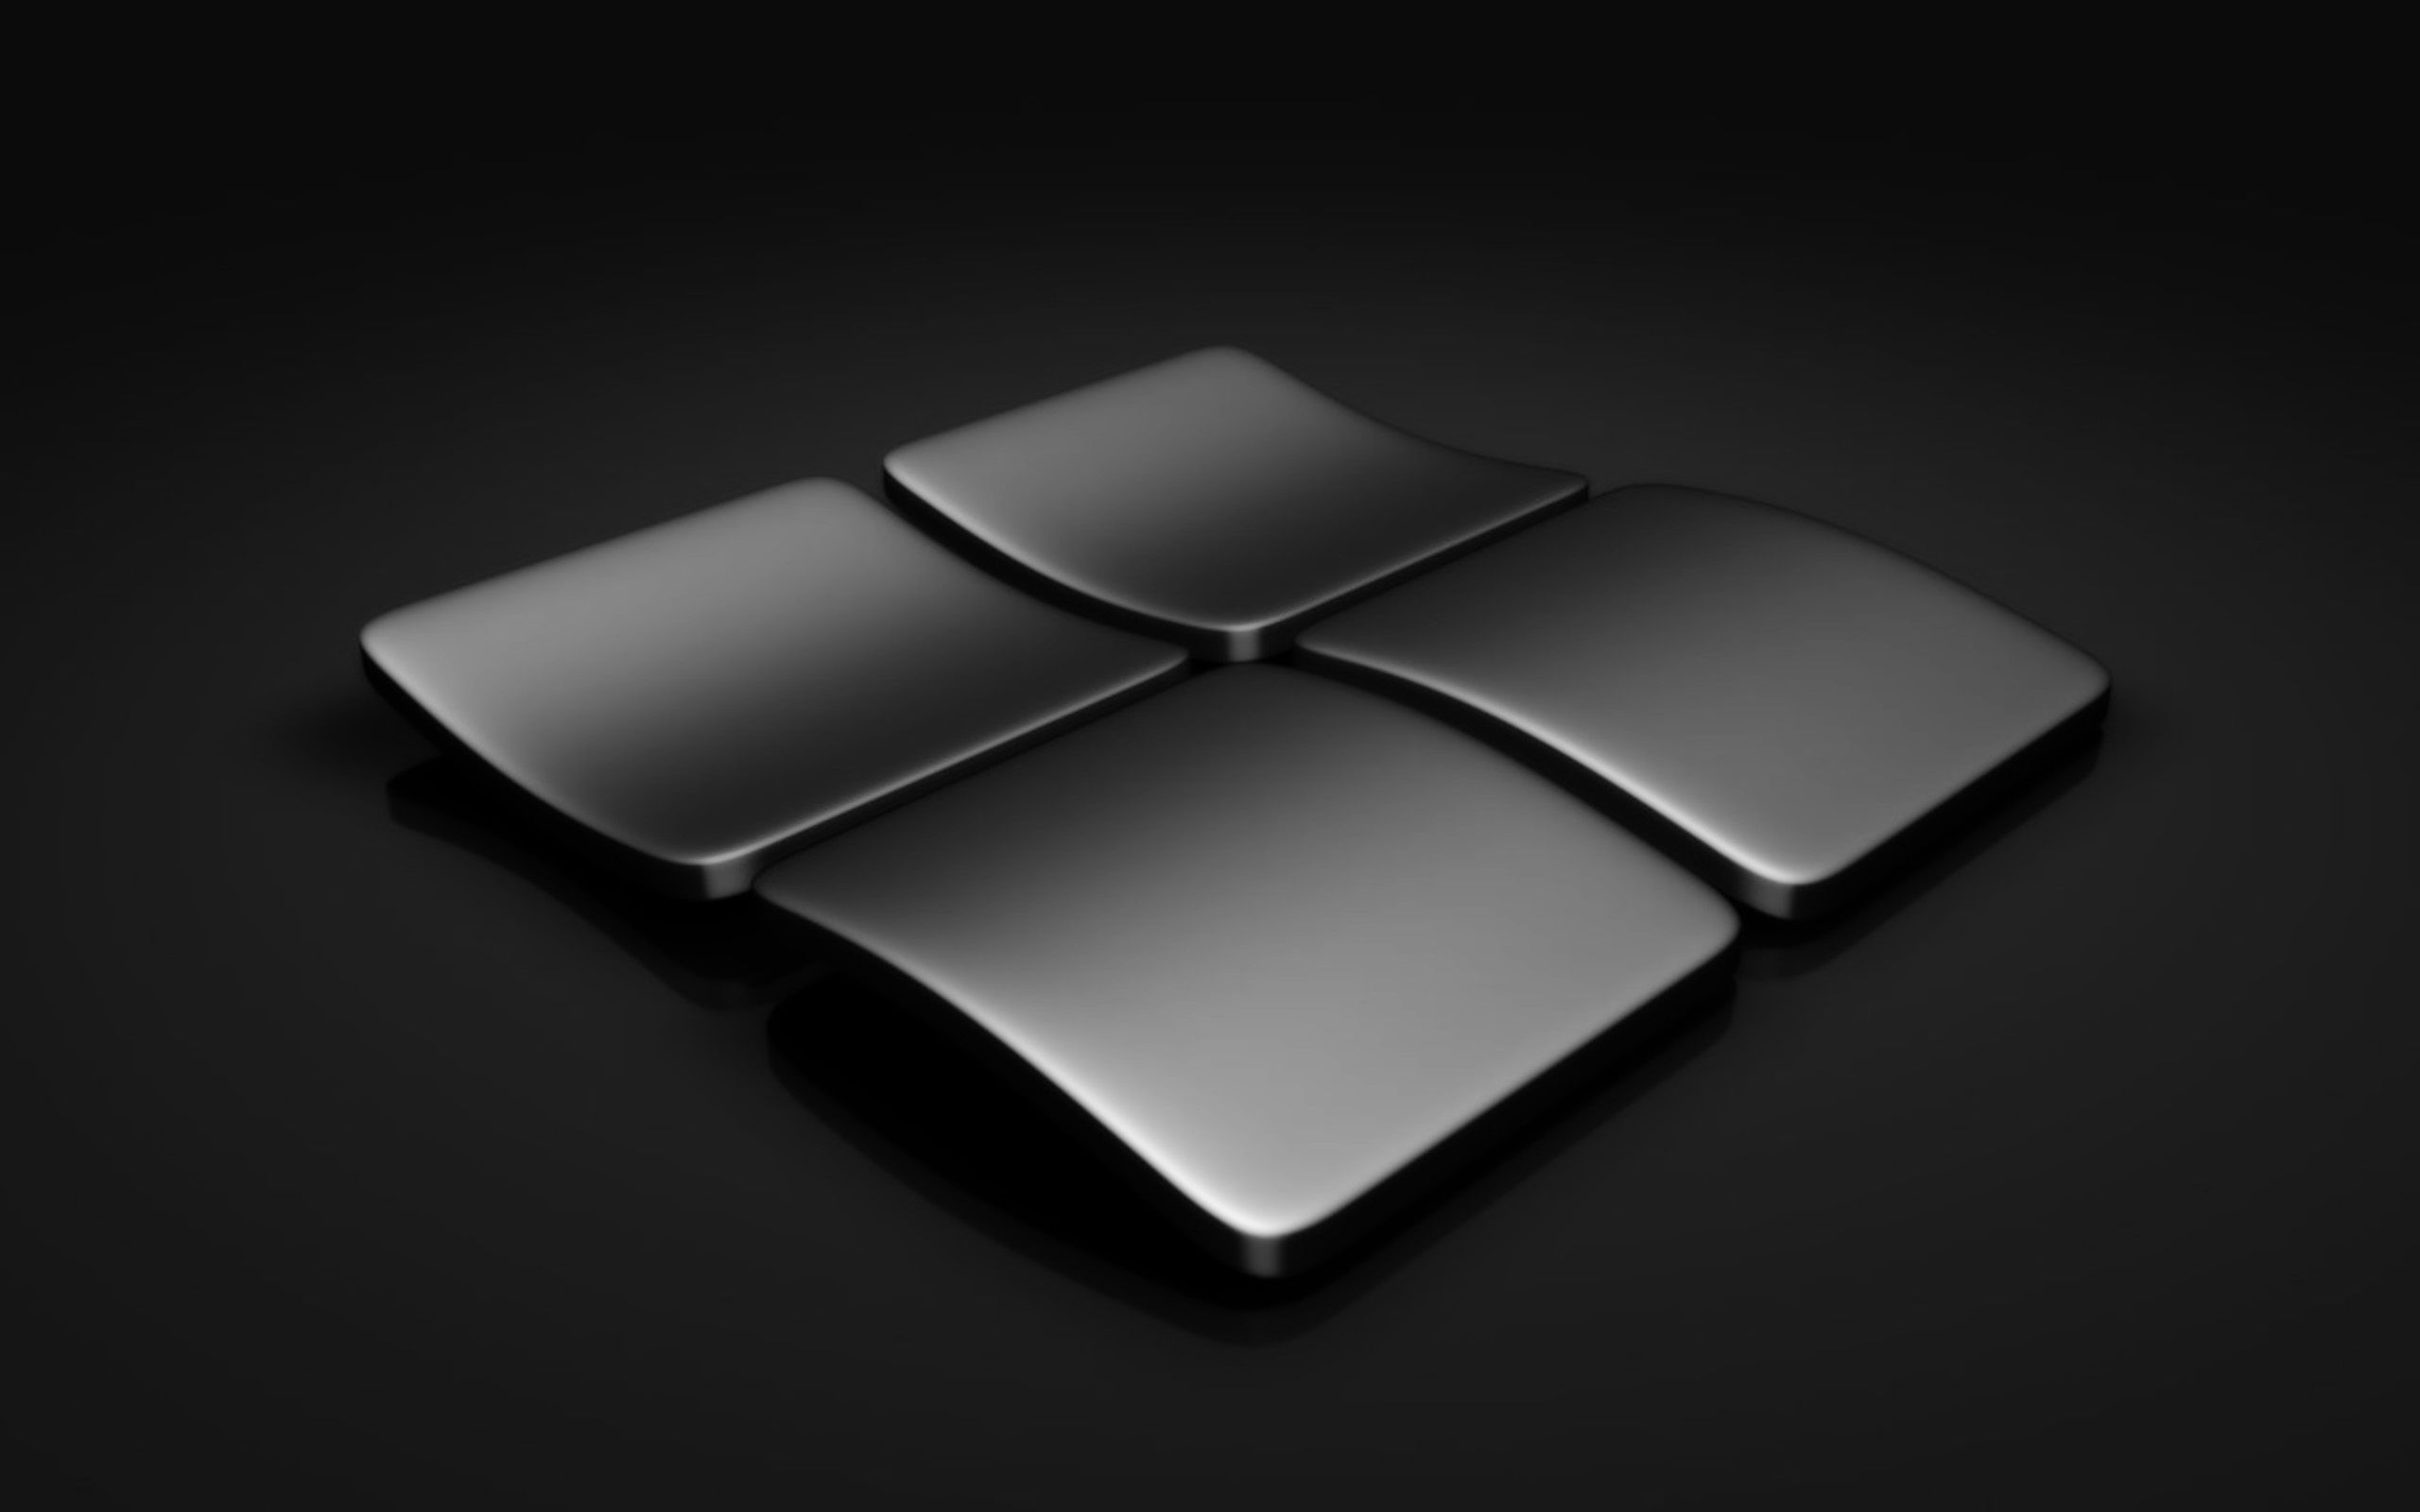 Black Windows 10 Hd Wallpapers Top Free Black Windows 10